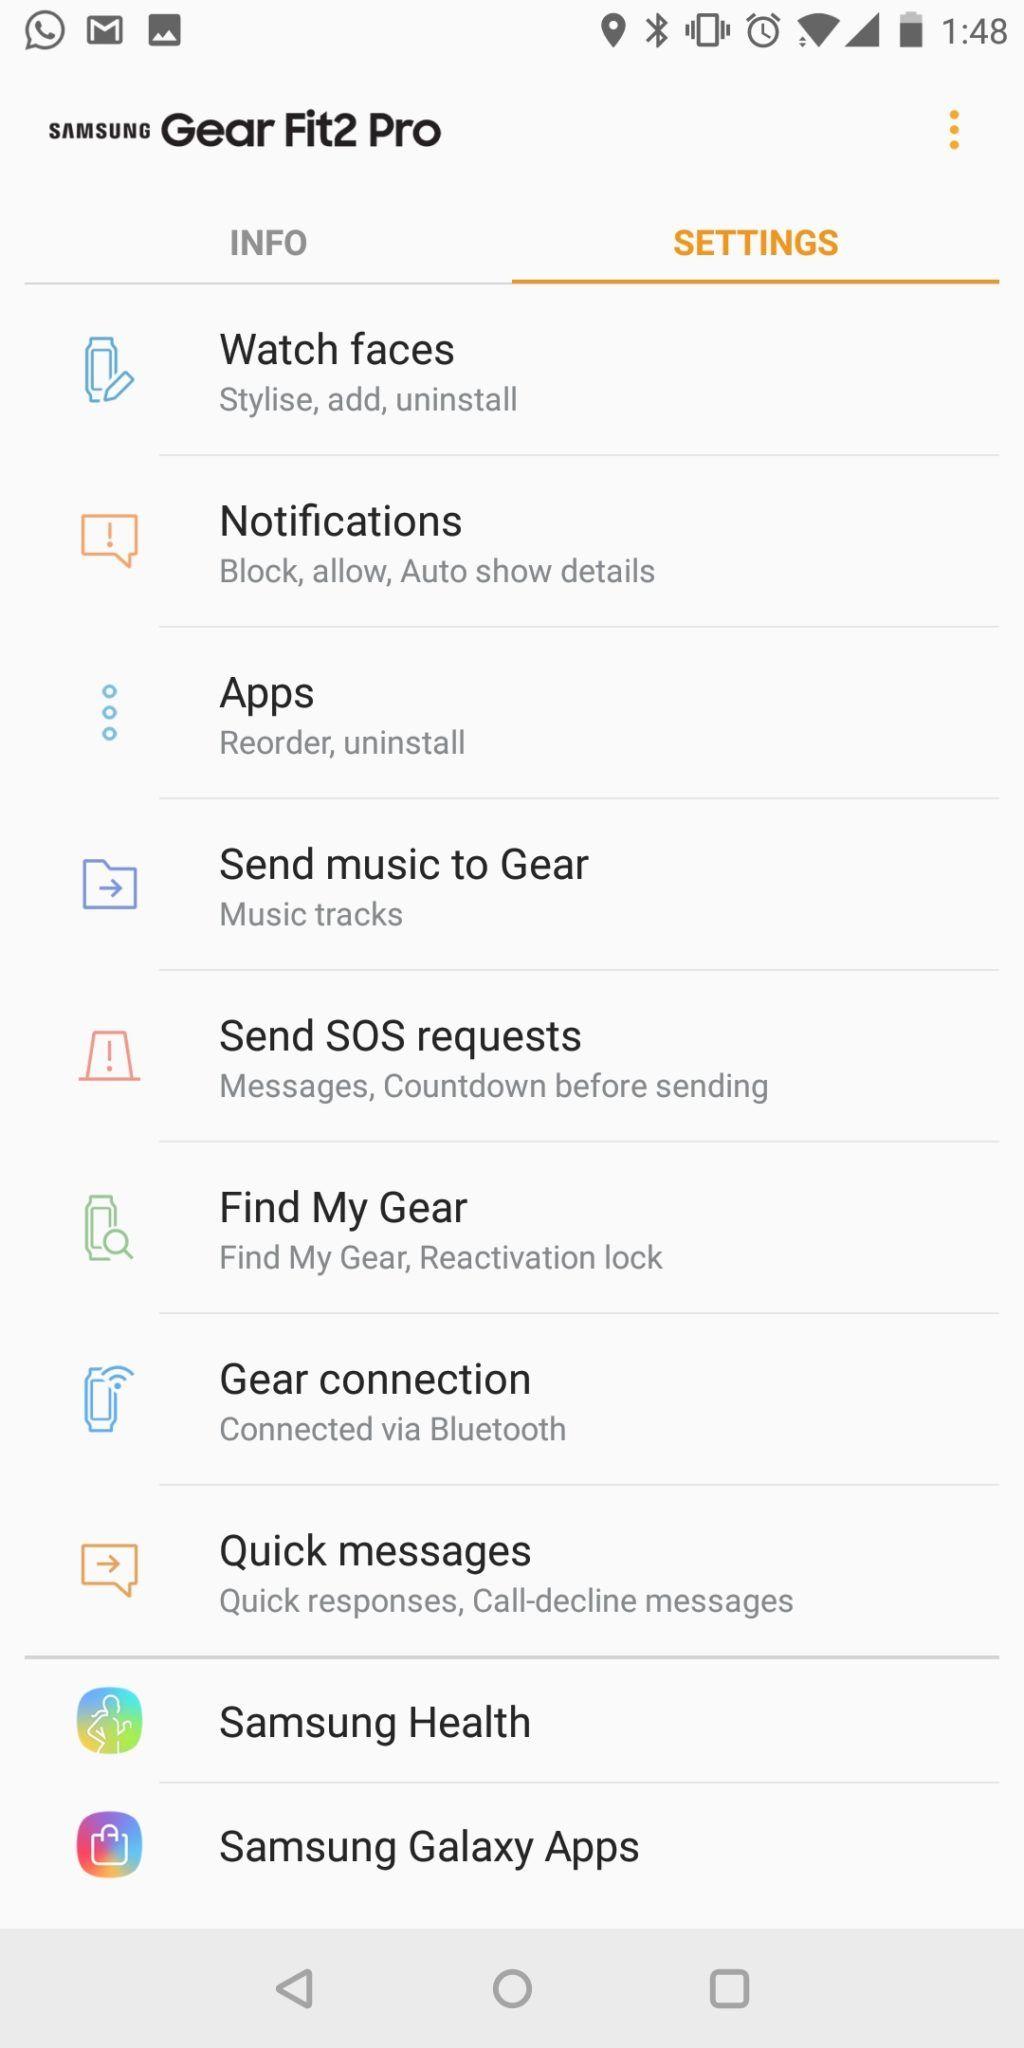 Samsung Gear Fit2 Pro app UI 2